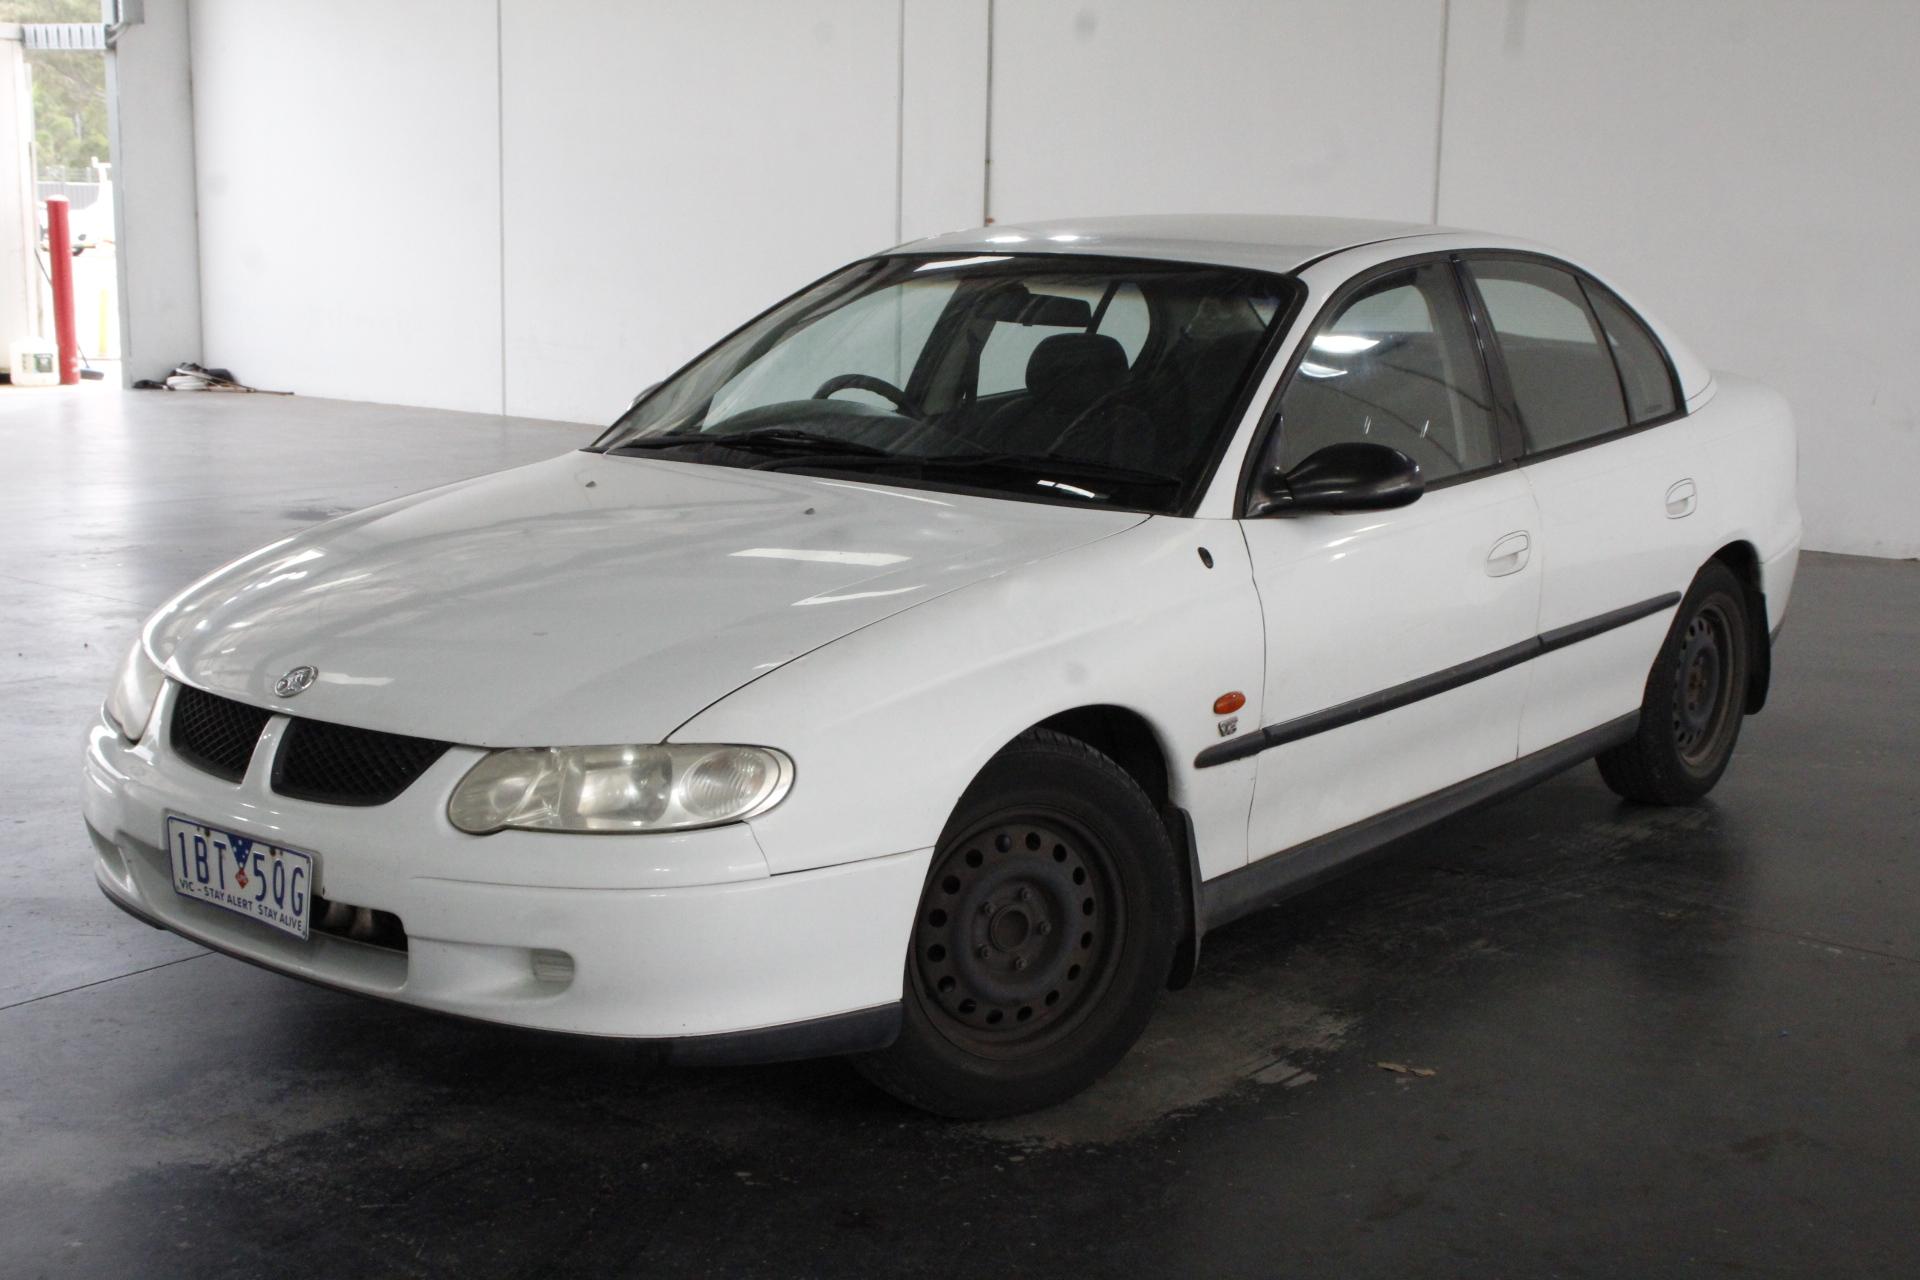 2002 Holden Commodore Executive VX Automatic Sedan